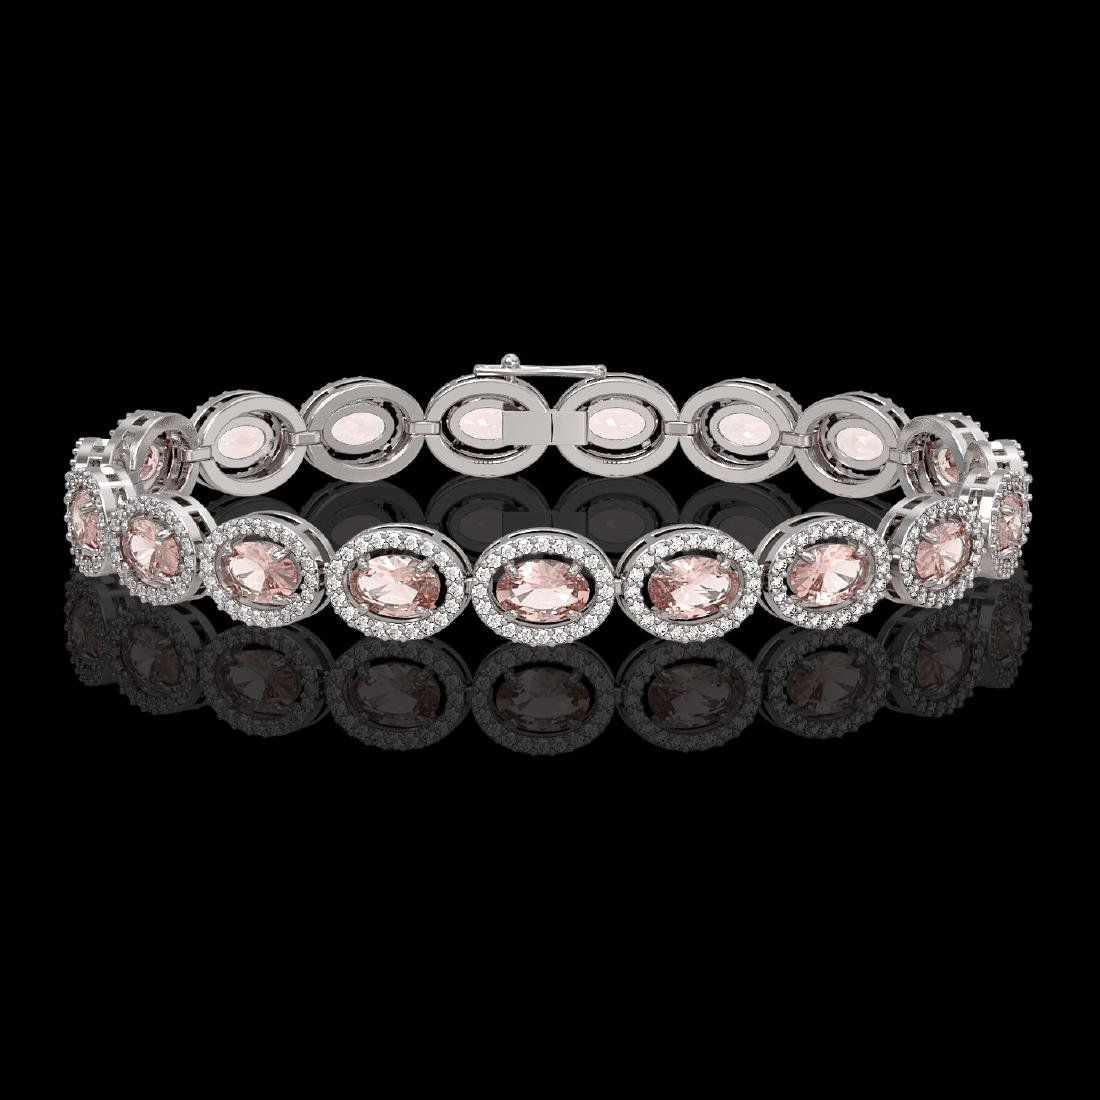 14.25 CTW Morganite & Diamond Halo Bracelet 10K White